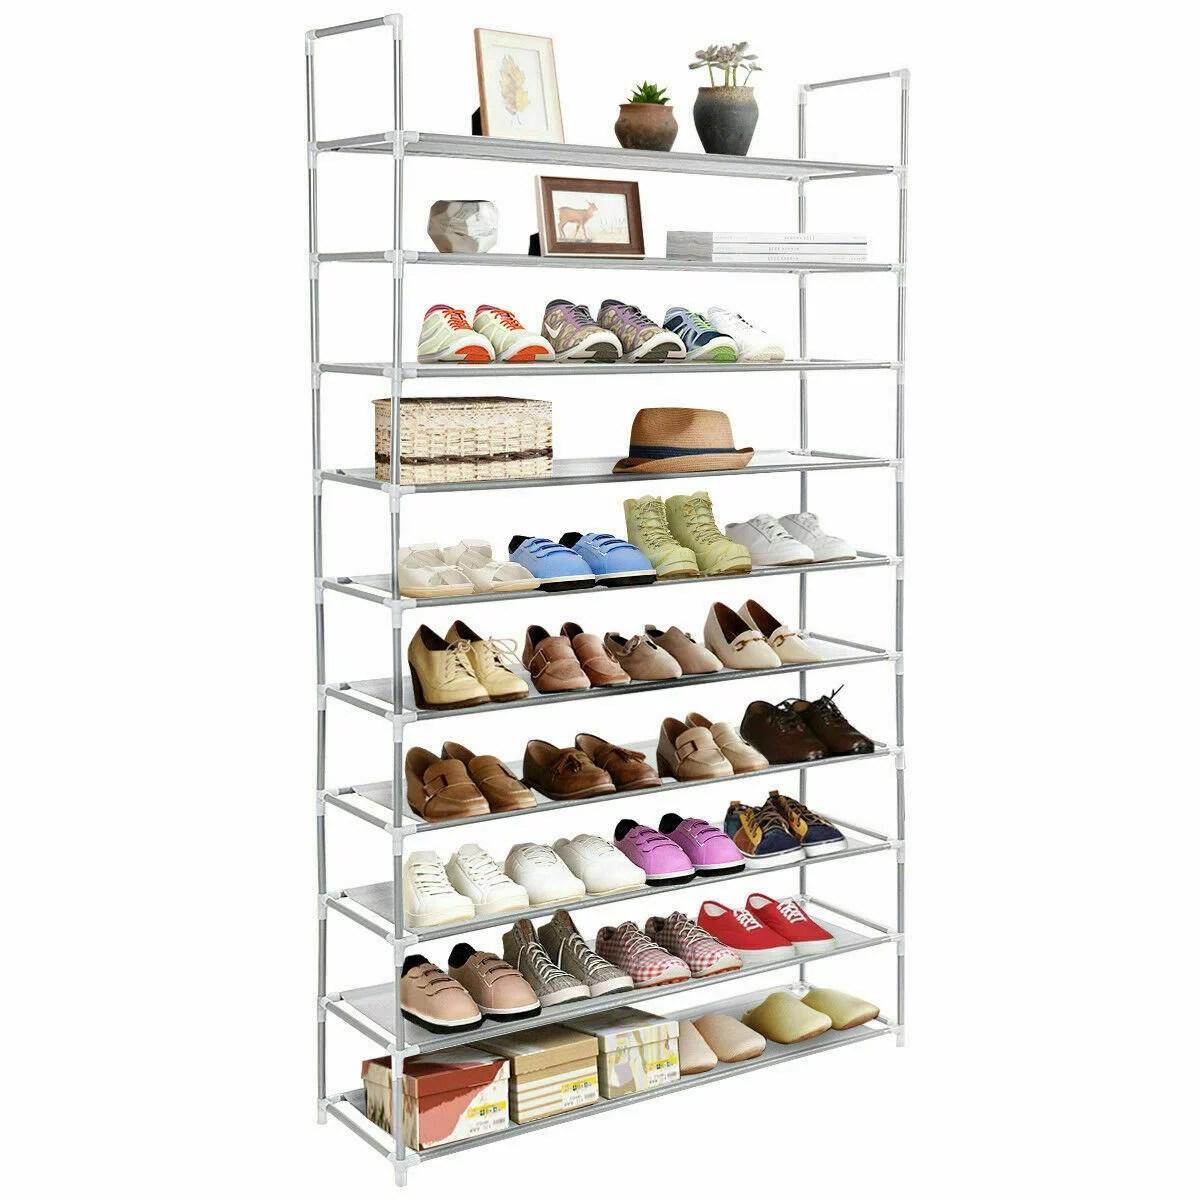 10 tiers shoe rack 50 pair stackable shoe rack storage shelves